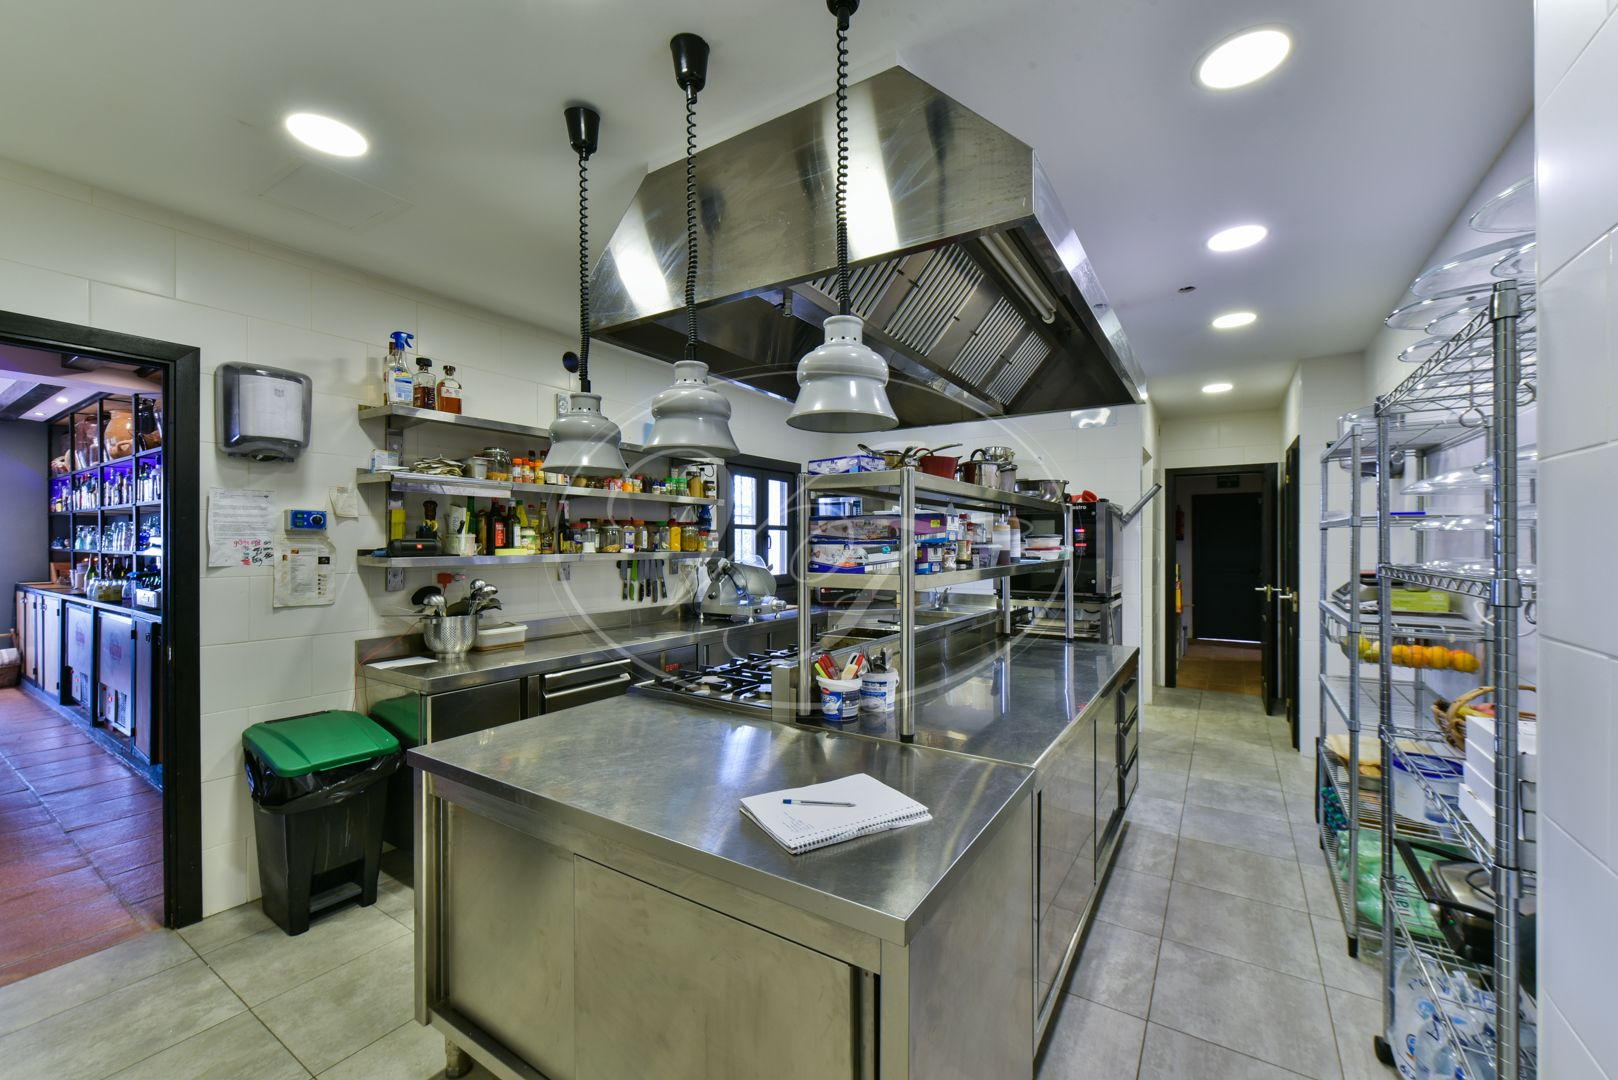 Cortijo for sale in Malaga